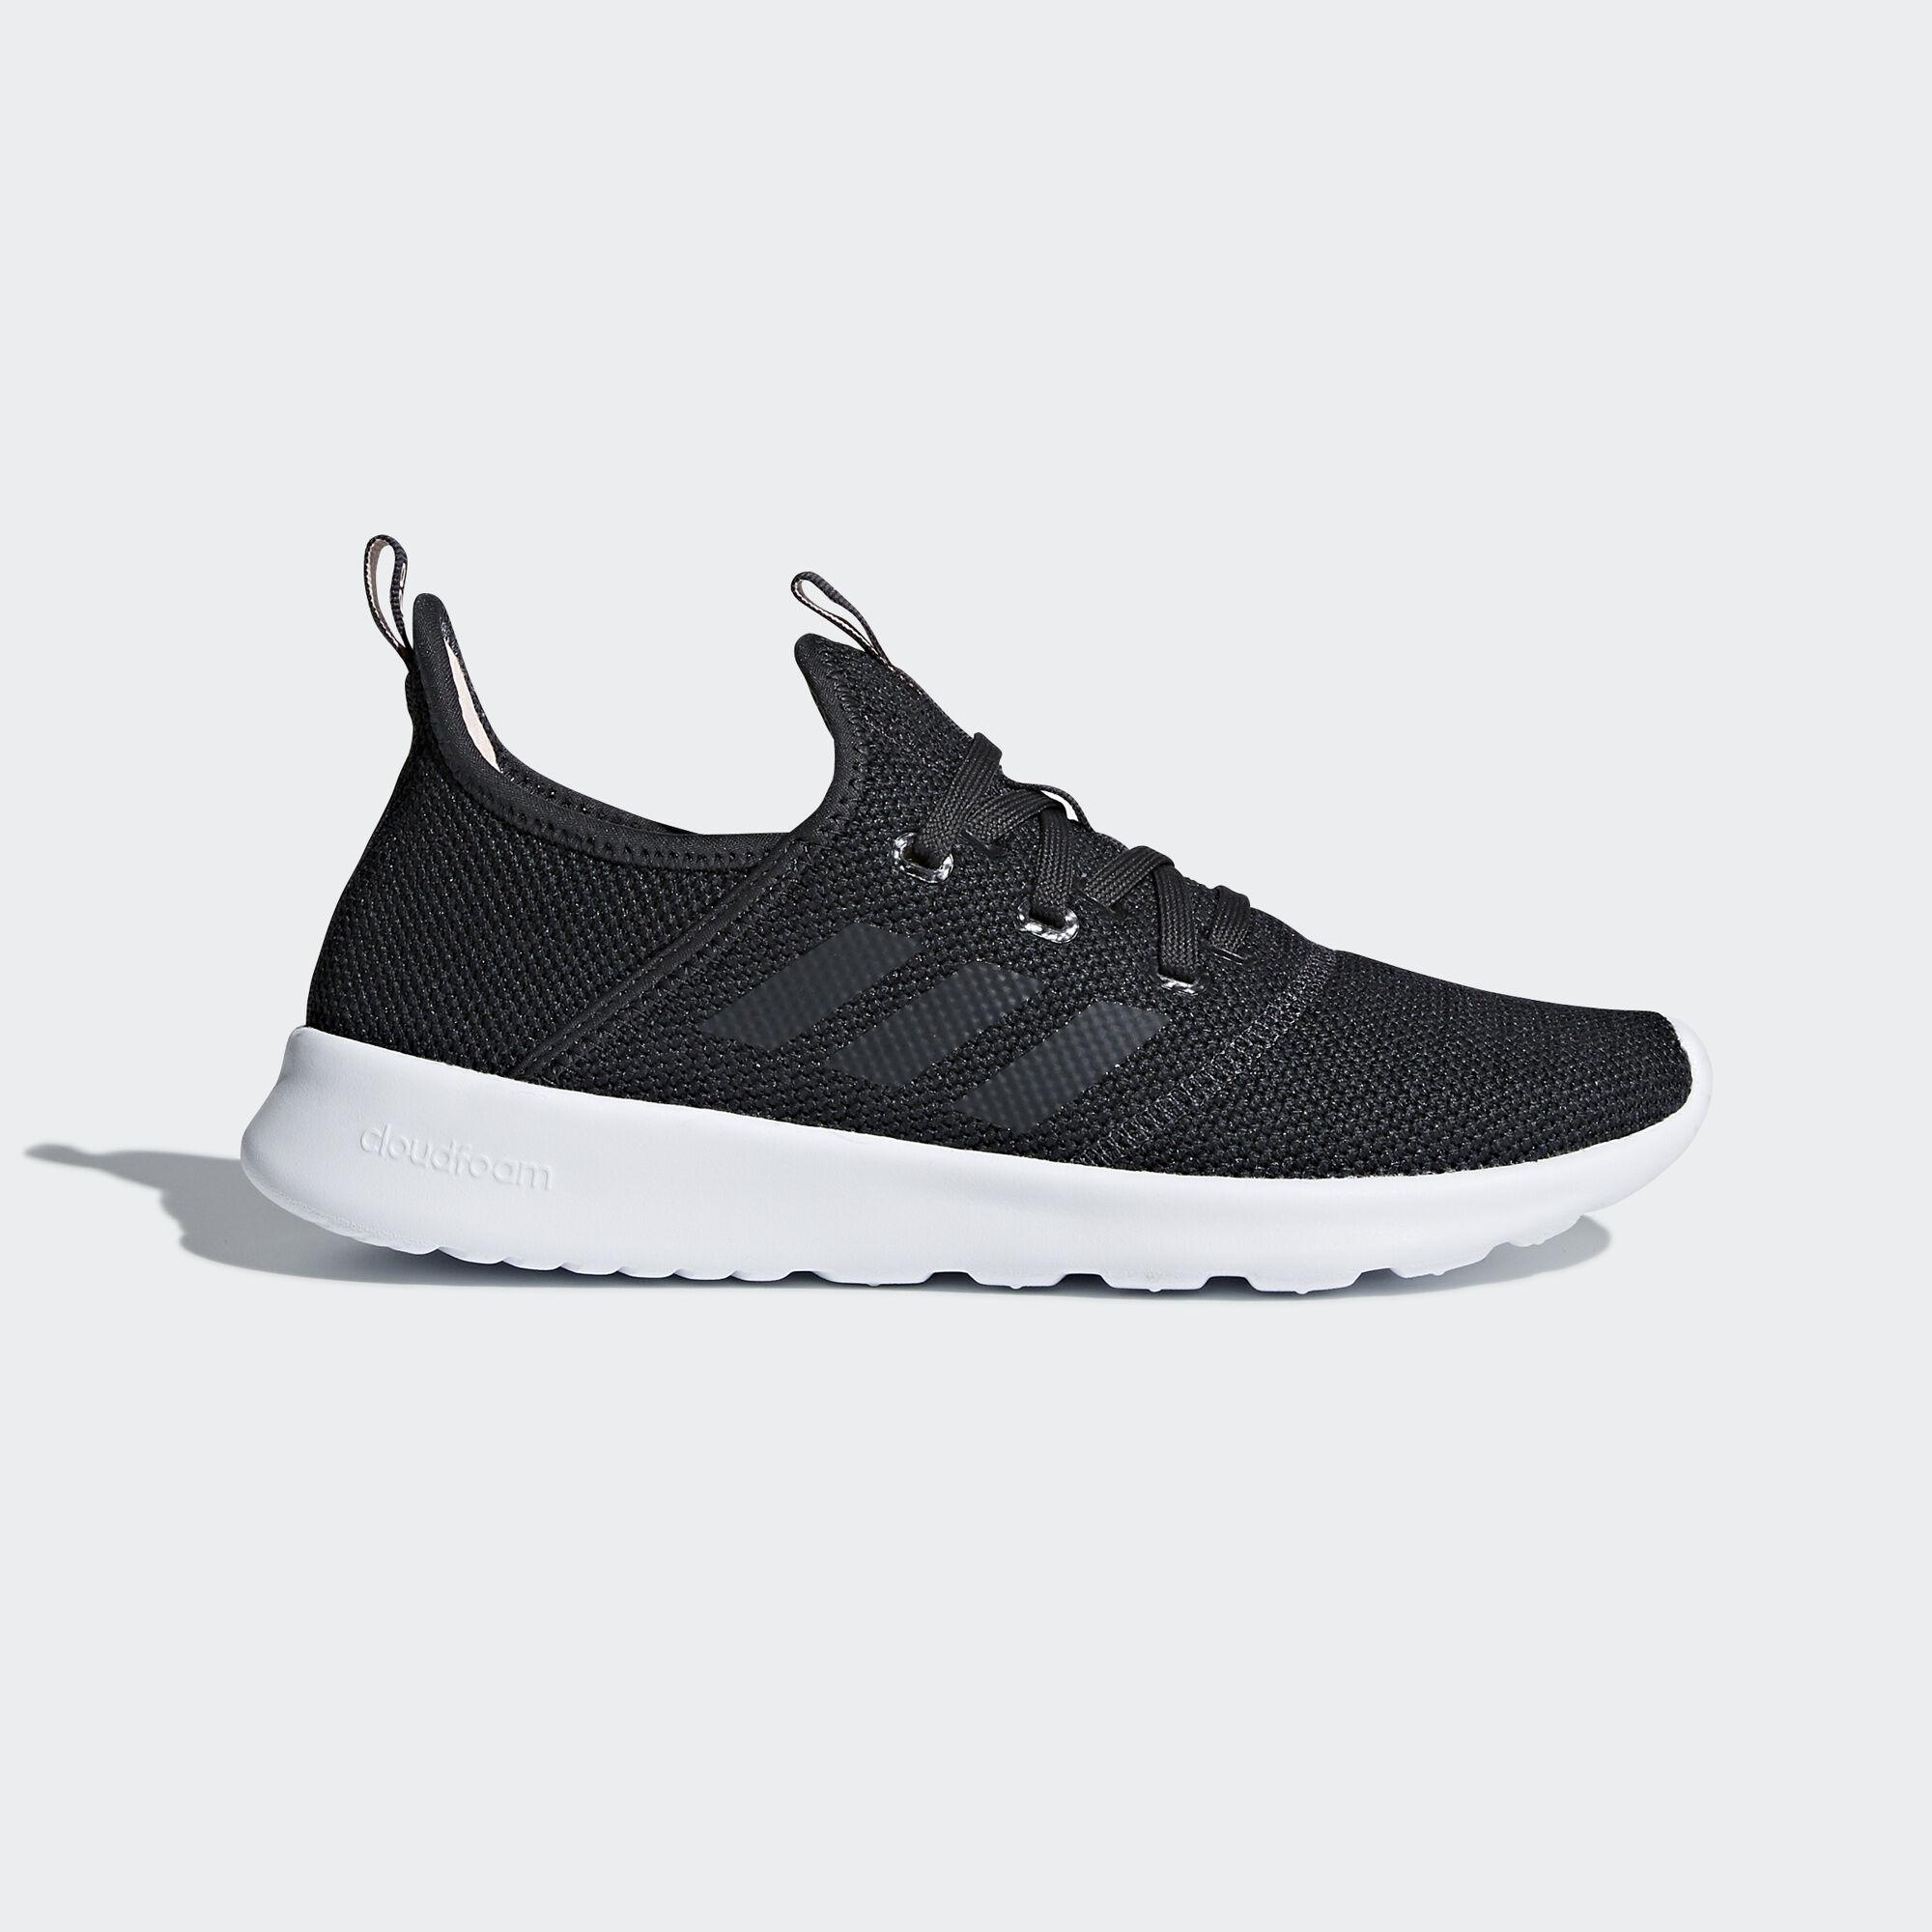 adidas cloudfoam release